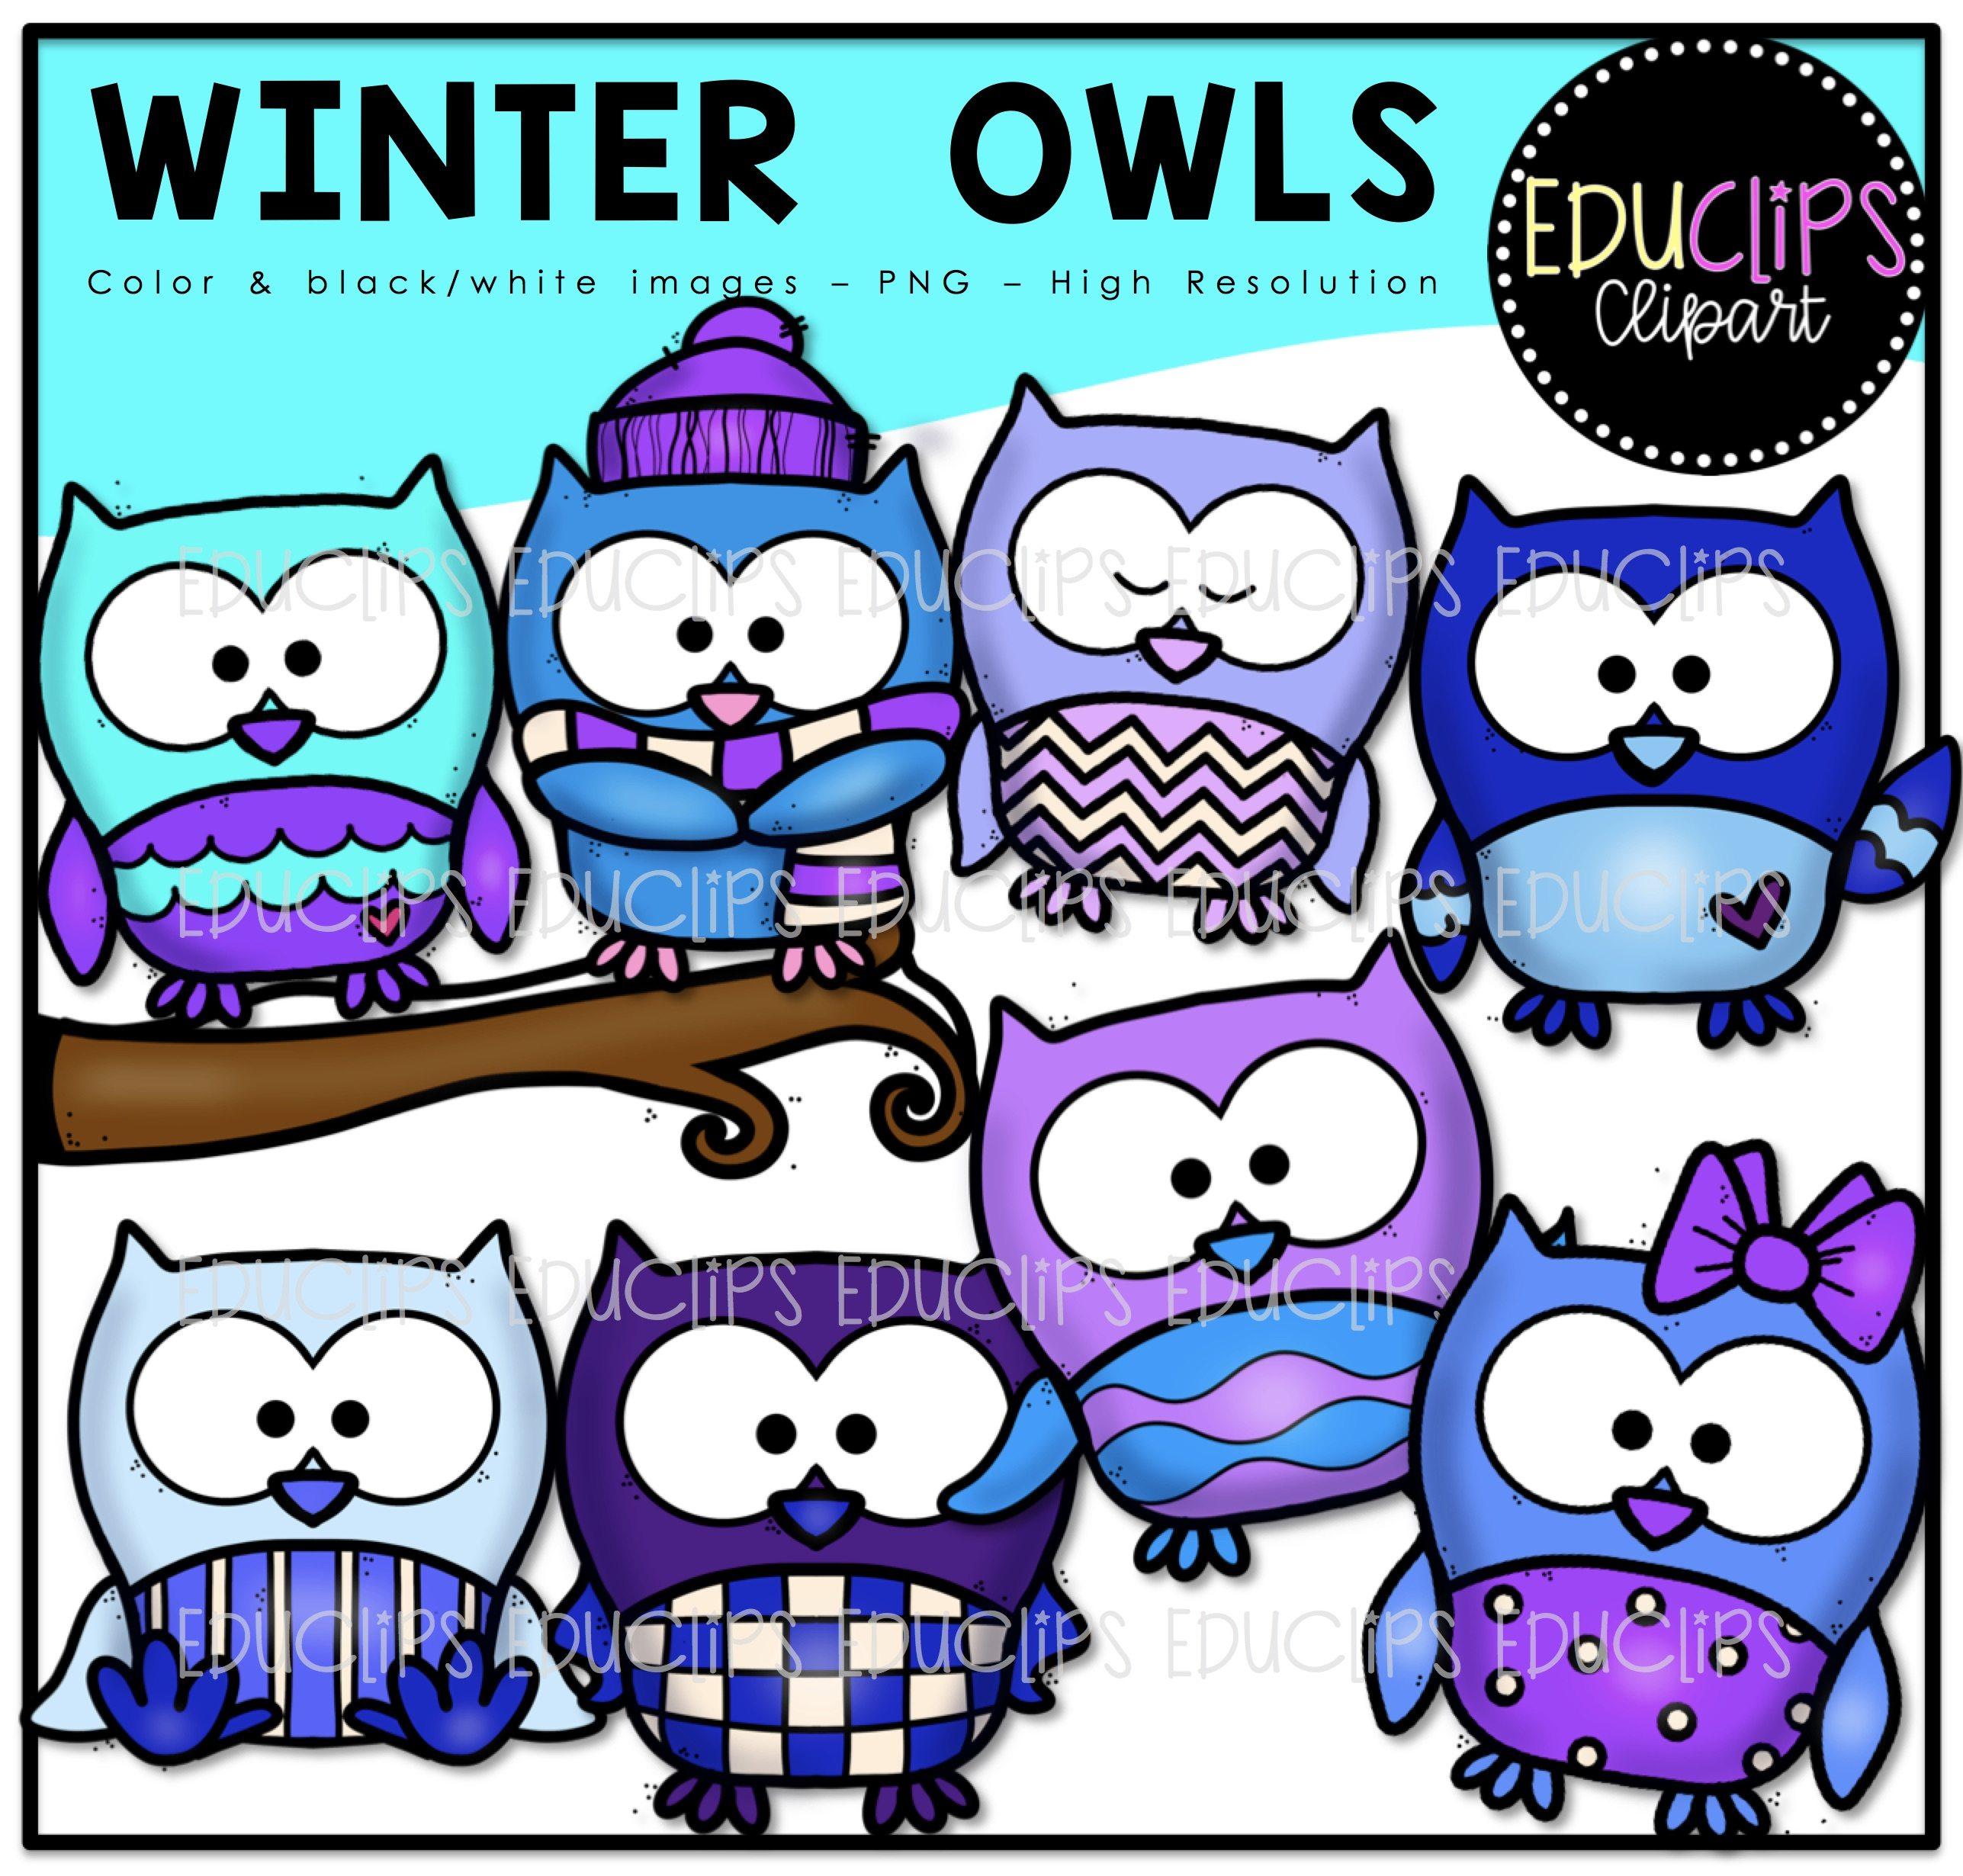 Color and art - Winter Owls Clip Art Bundle Color And B W